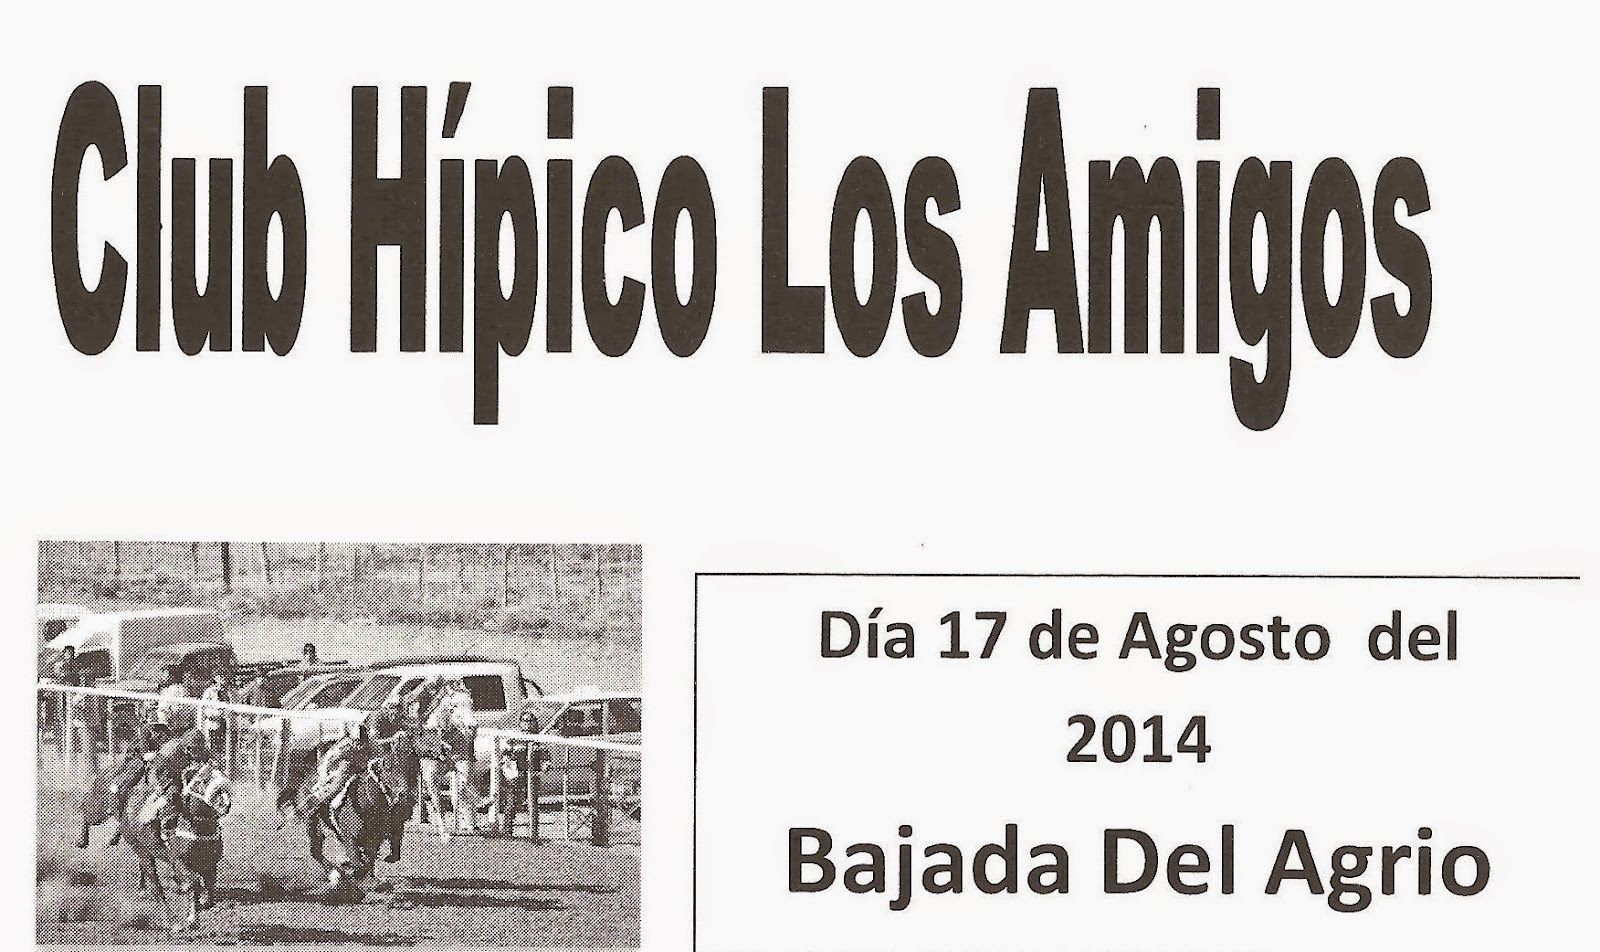 http://turfdelapatagonia.blogspot.com.ar/2014/08/1708-rograma-de-carreras-de-caballos-en.html